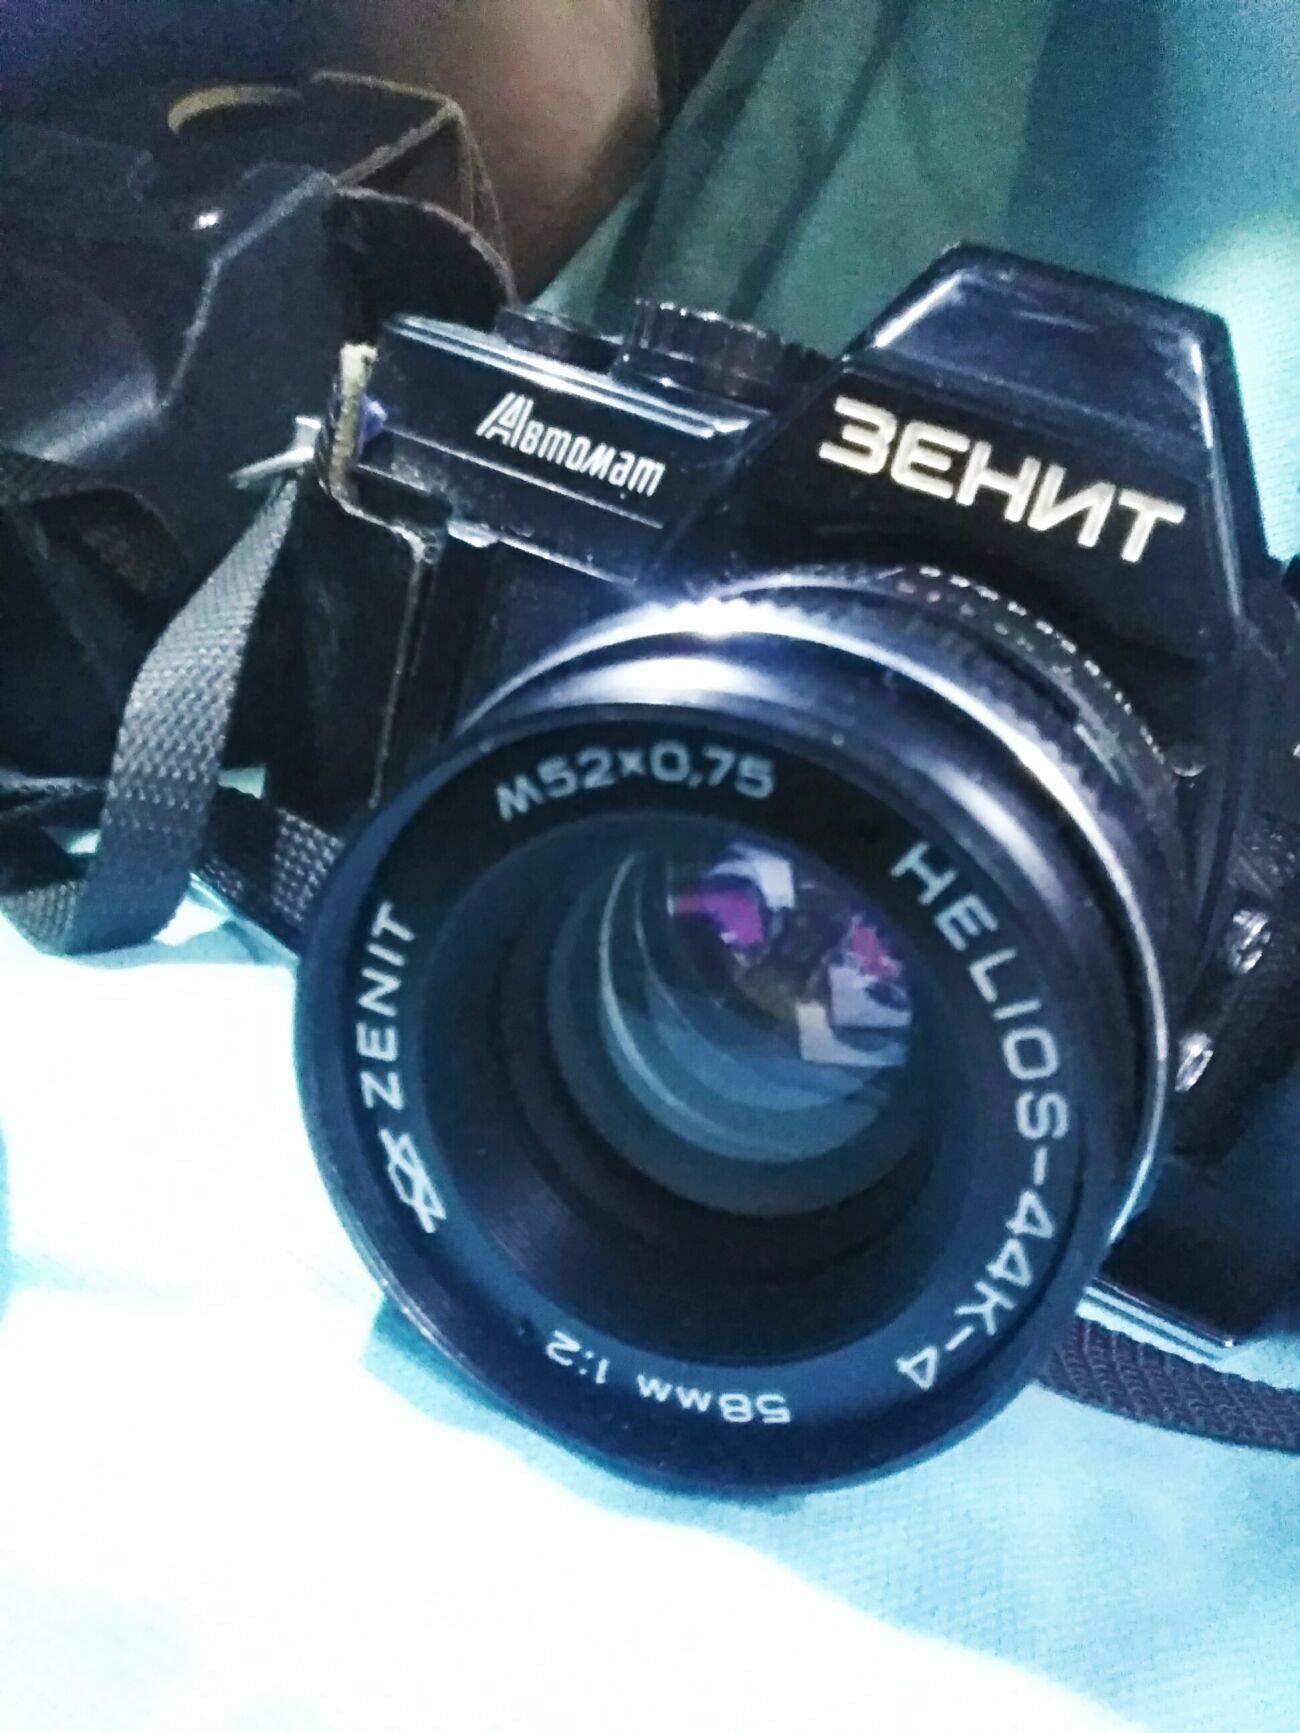 вдвое меньше, фотоаппарат зенит автомат фотографии всегда